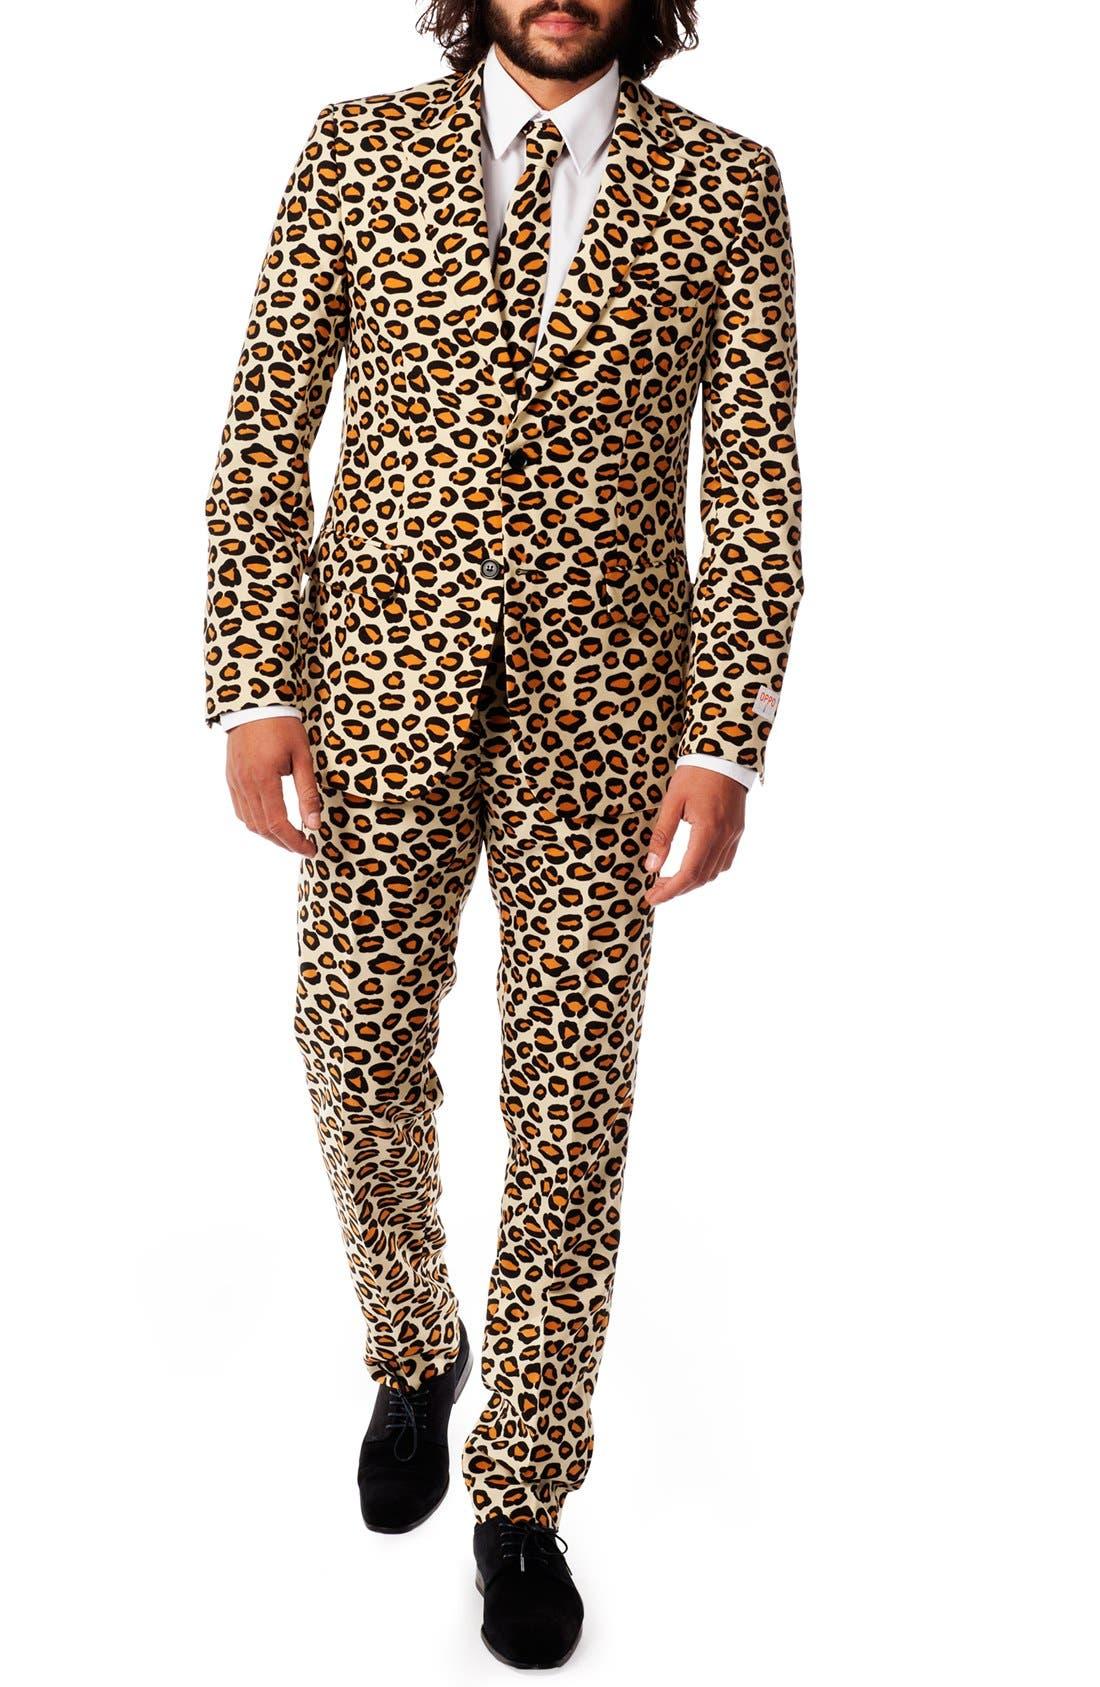 'The Jag' Trim Fit Two-Piece Suit with Tie,                             Main thumbnail 1, color,                             Dark Beige